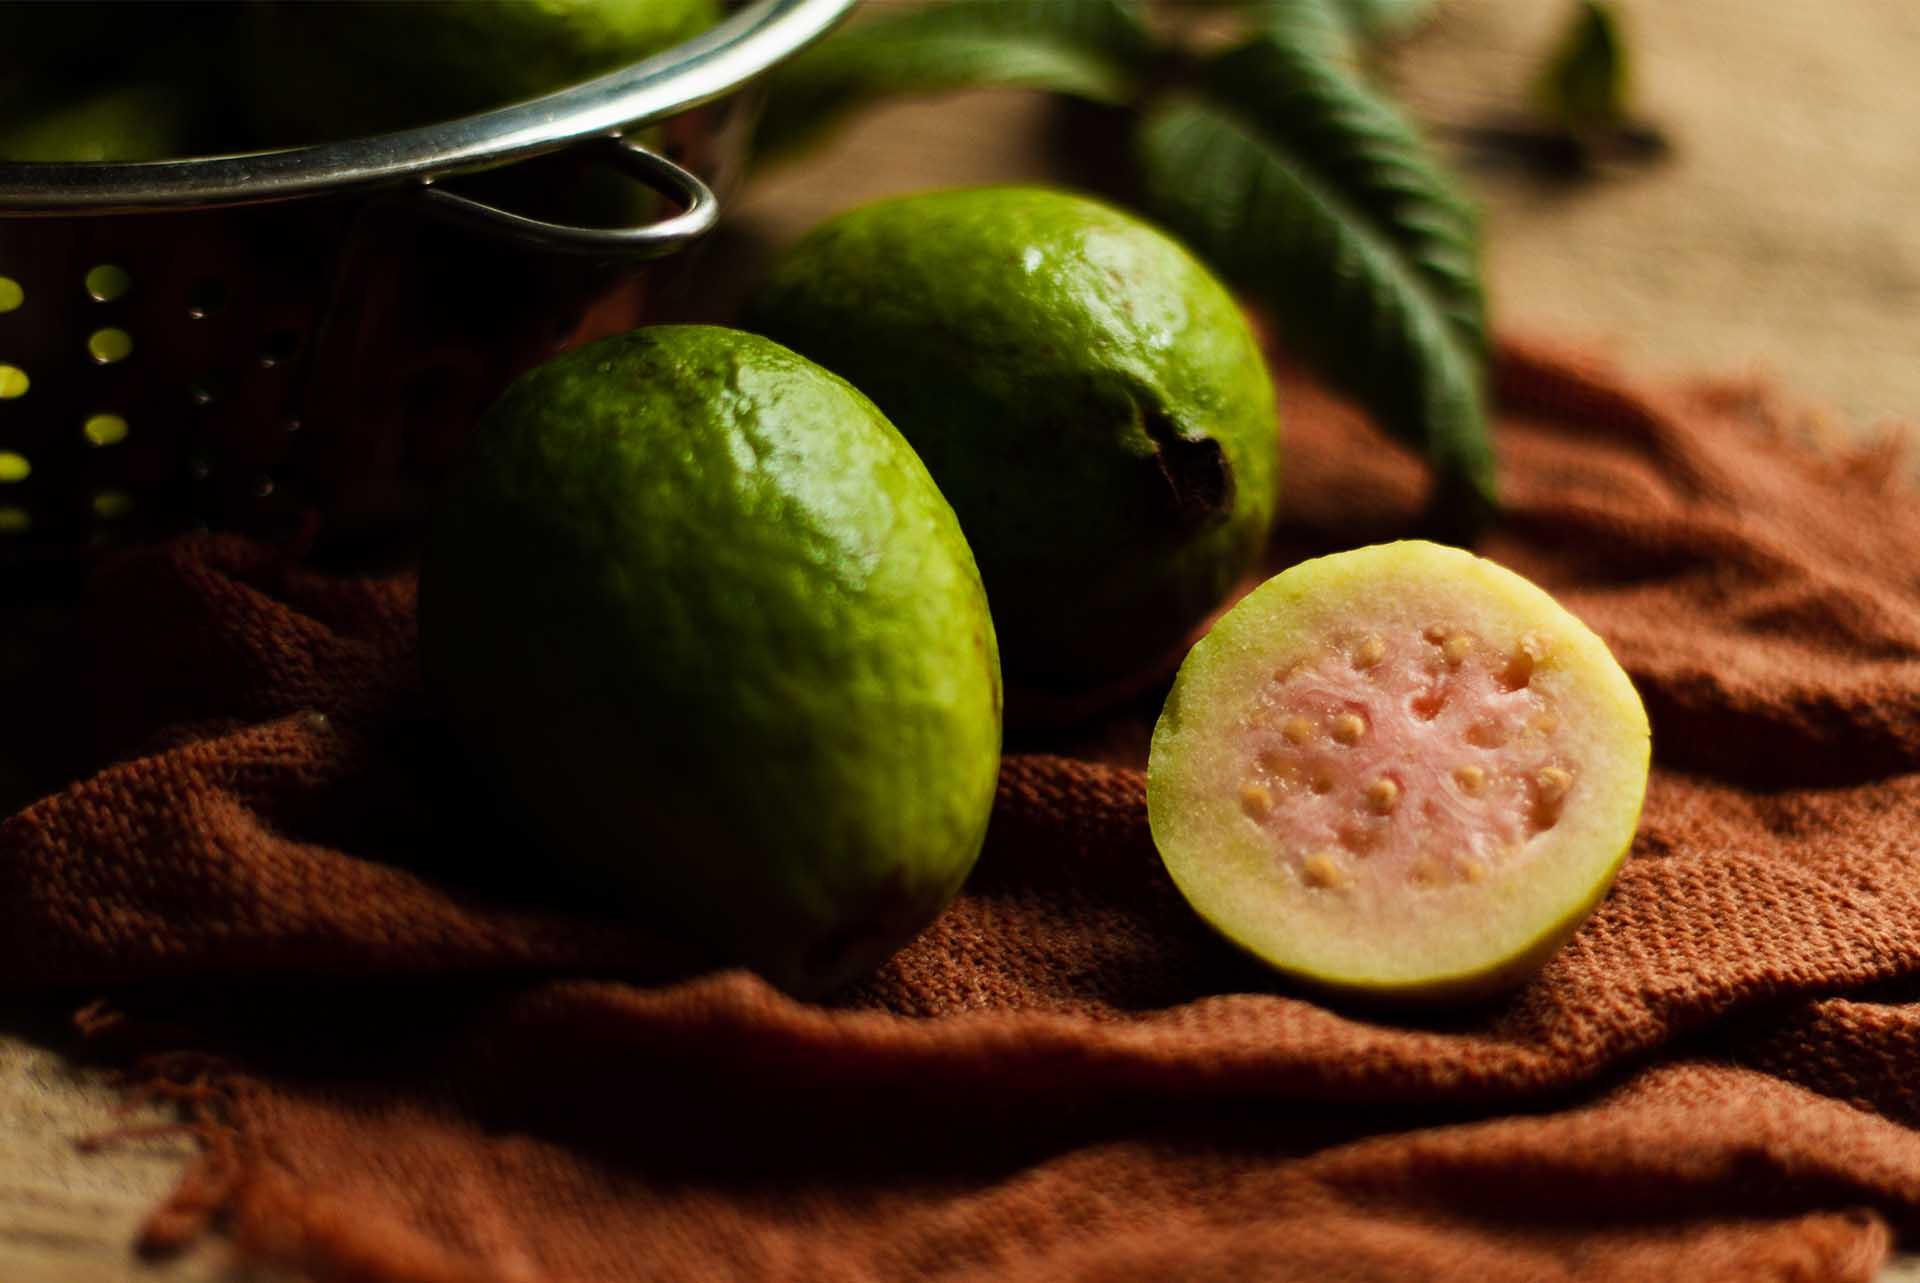 Guava Meyvesine Dair Bilinmesi Gereken Her Şey